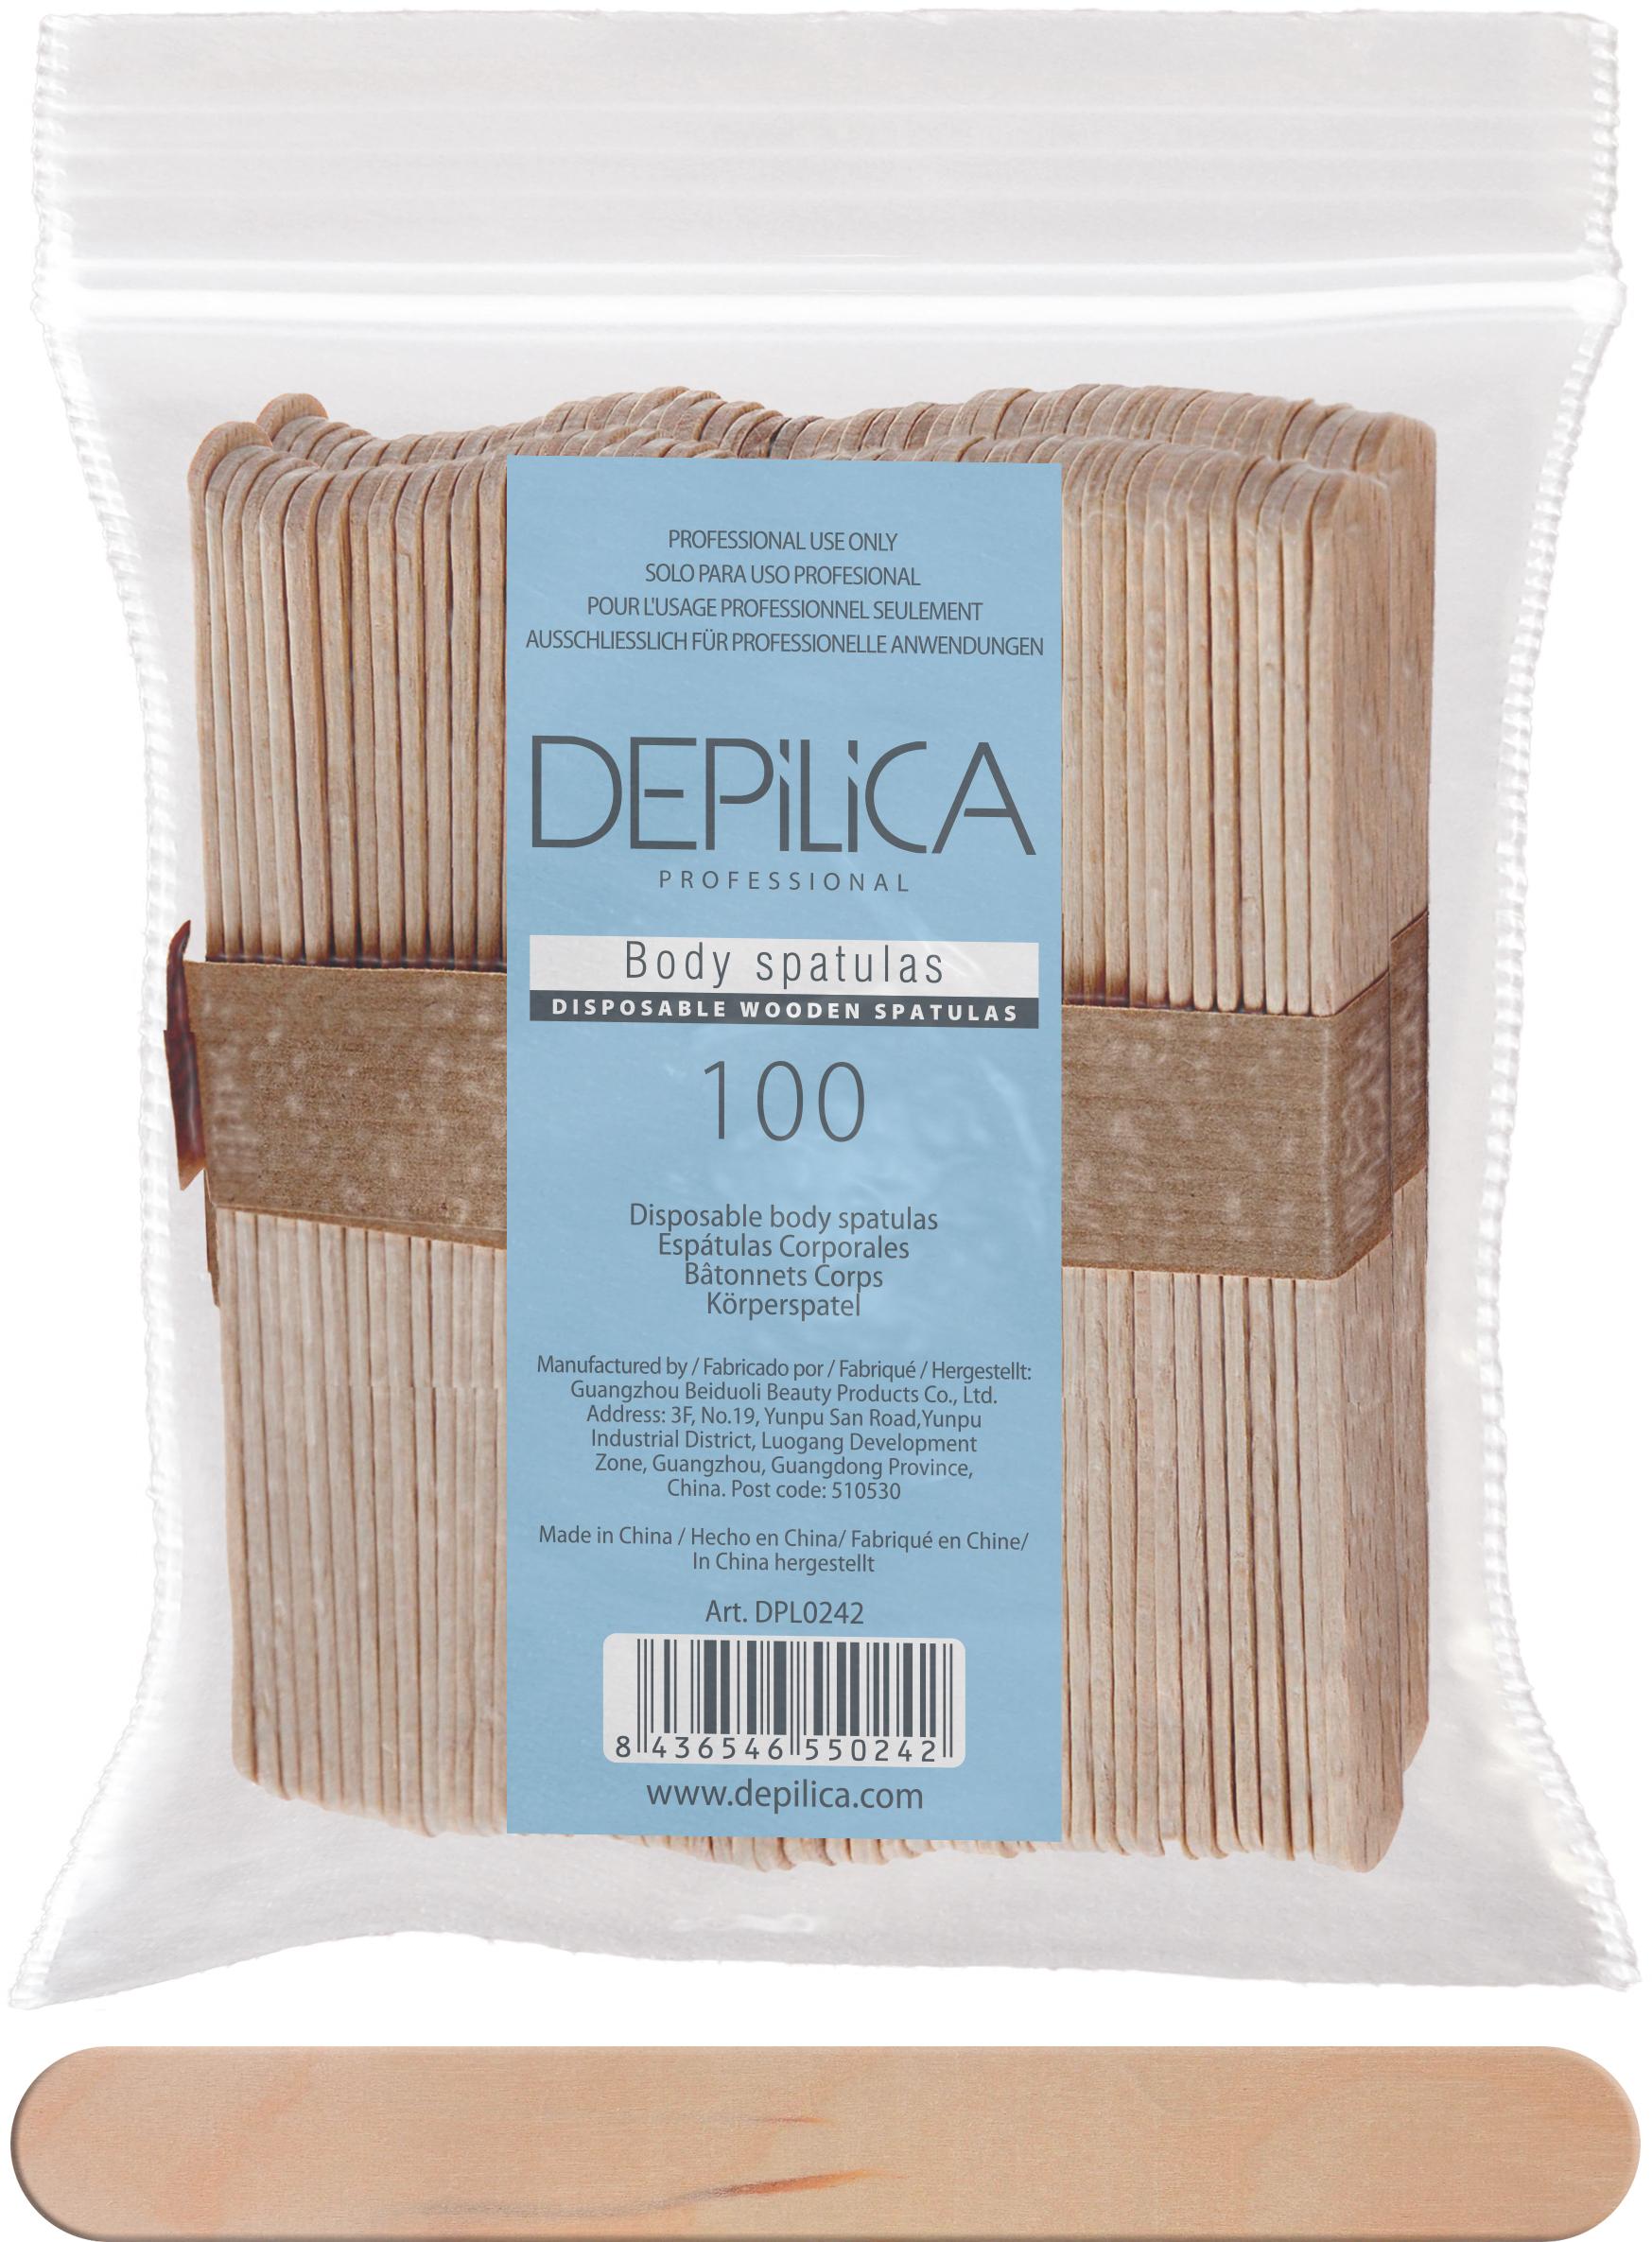 DEPILICA PROFESSIONAL Шпатели деревянные одноразовые для тела / Disposable Wooden body s patulas 100шт